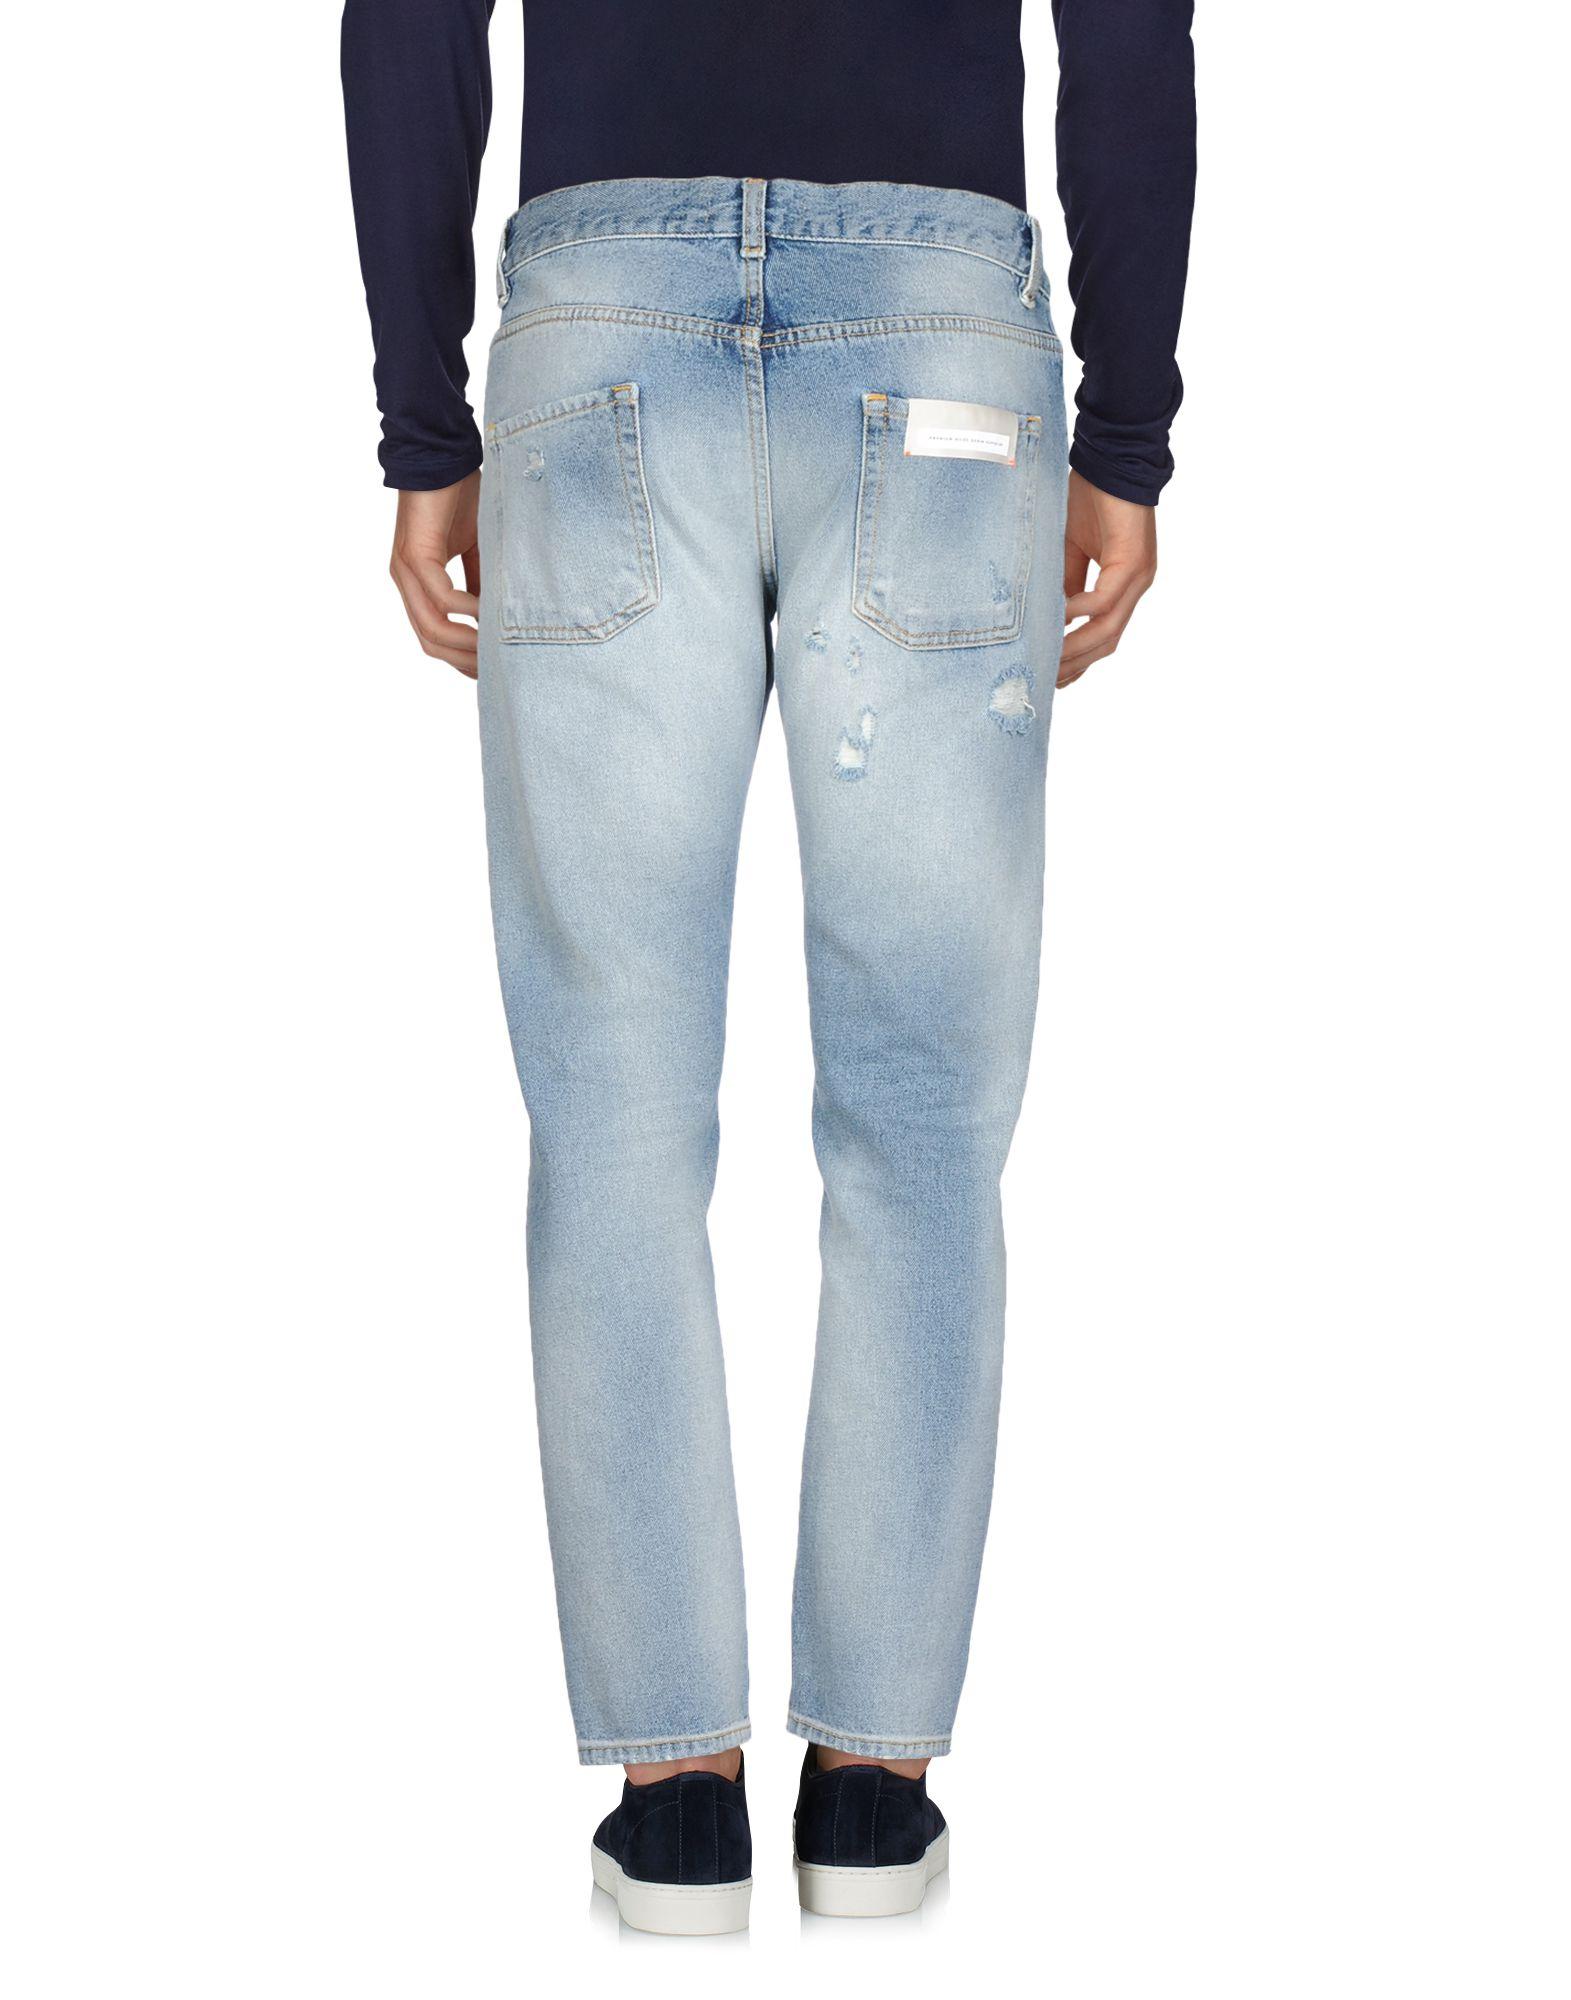 Pantaloni Denim Jeans Pmds Premium Mood Denim Pantaloni Superior Uomo - 42665519GR d29a57